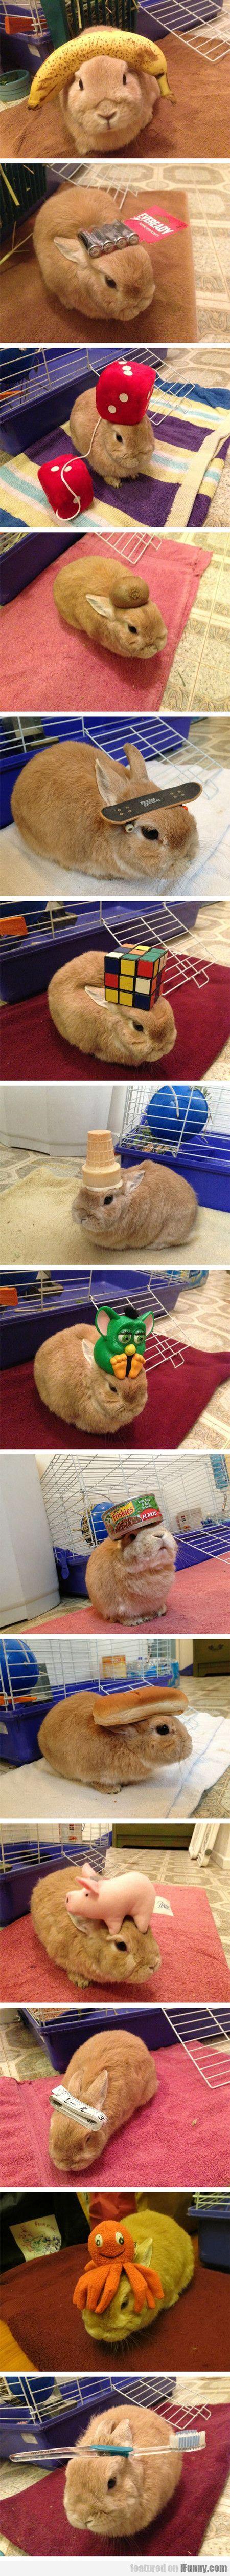 Different Stuff On My Rabbit